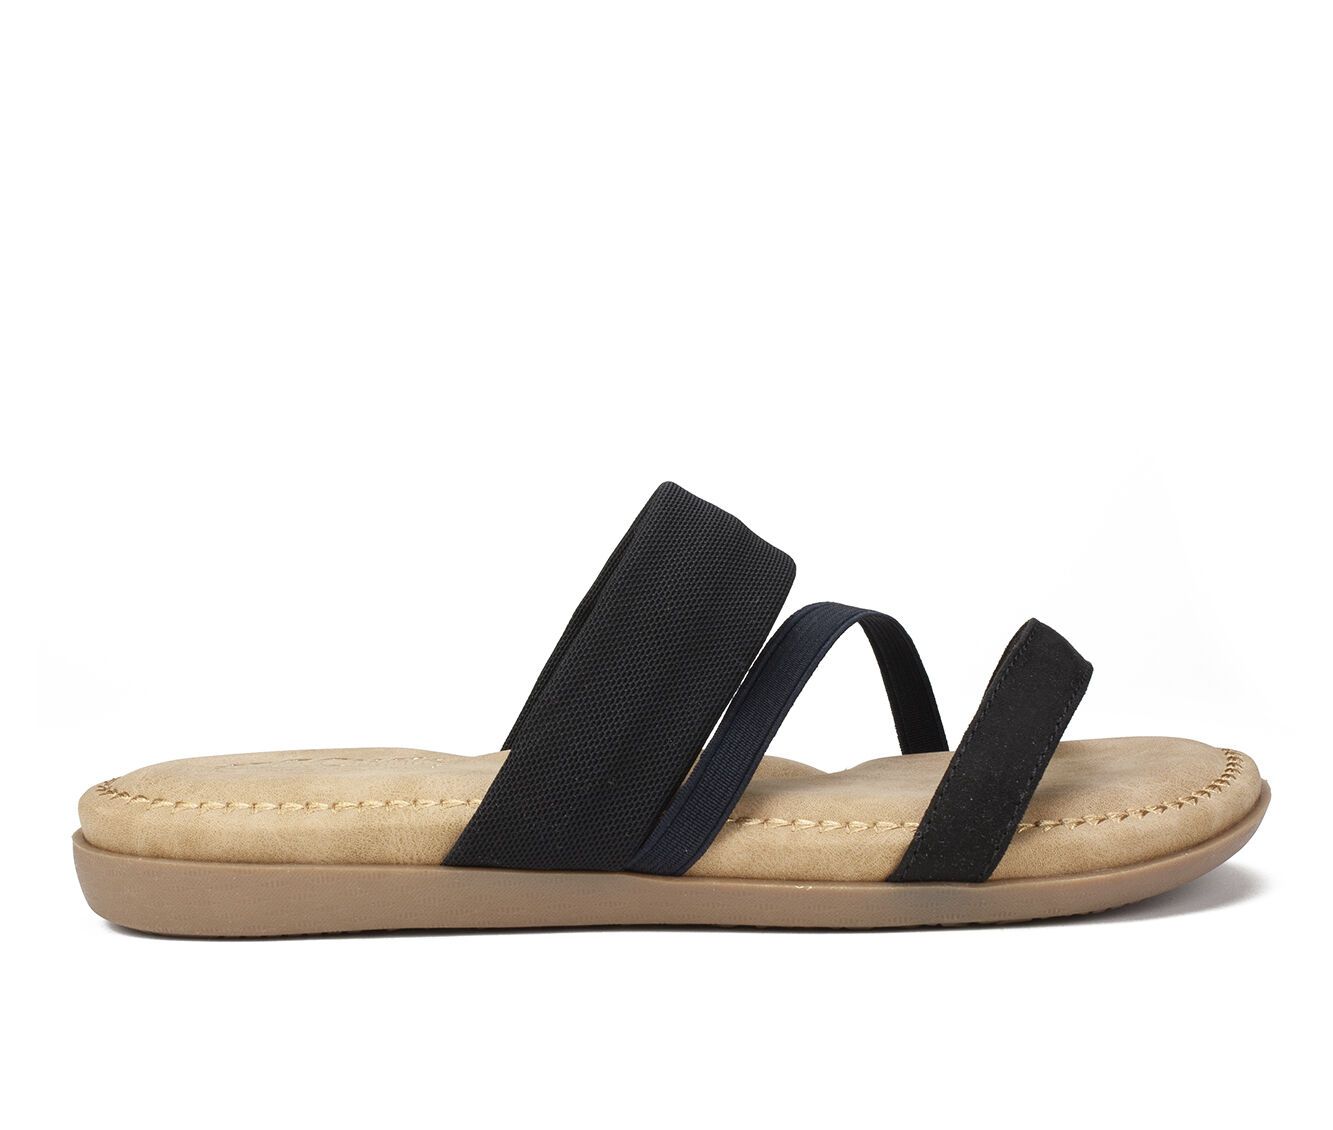 Women's Cliffs Farris Strappy Sandals Black